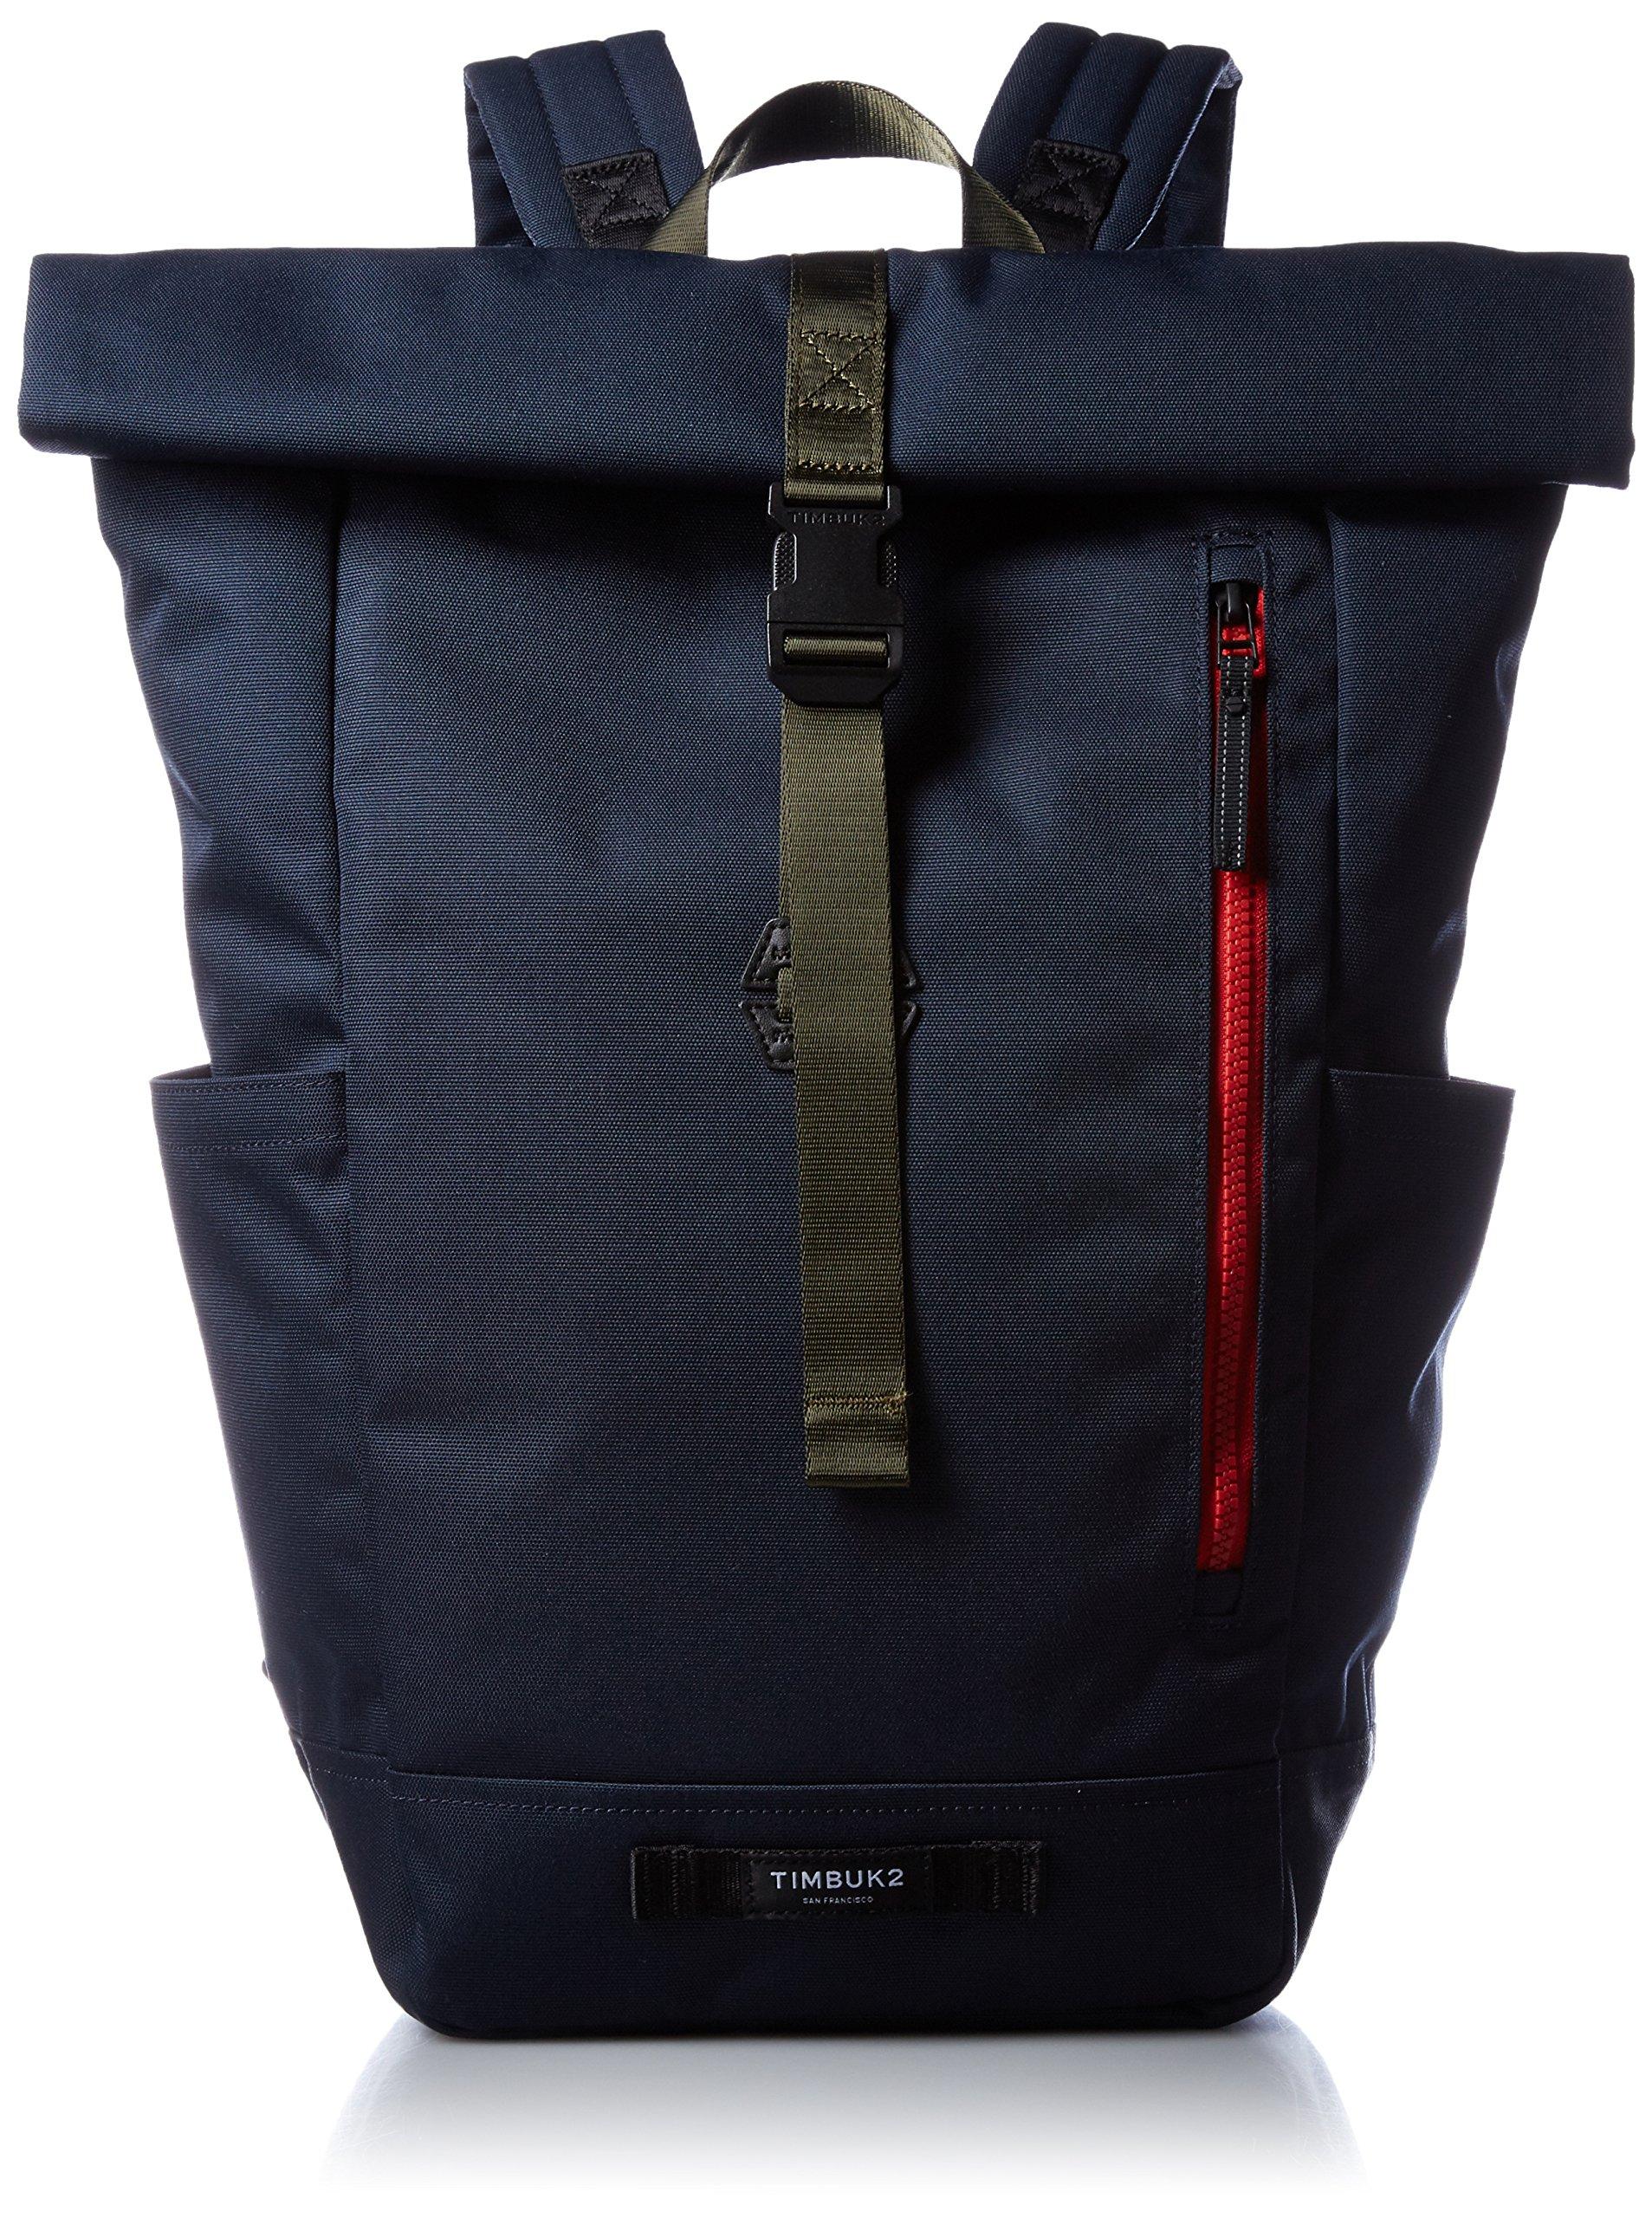 Timbuk2 Tuck Pack, Nautical/Bixi, One Size by Timbuk2